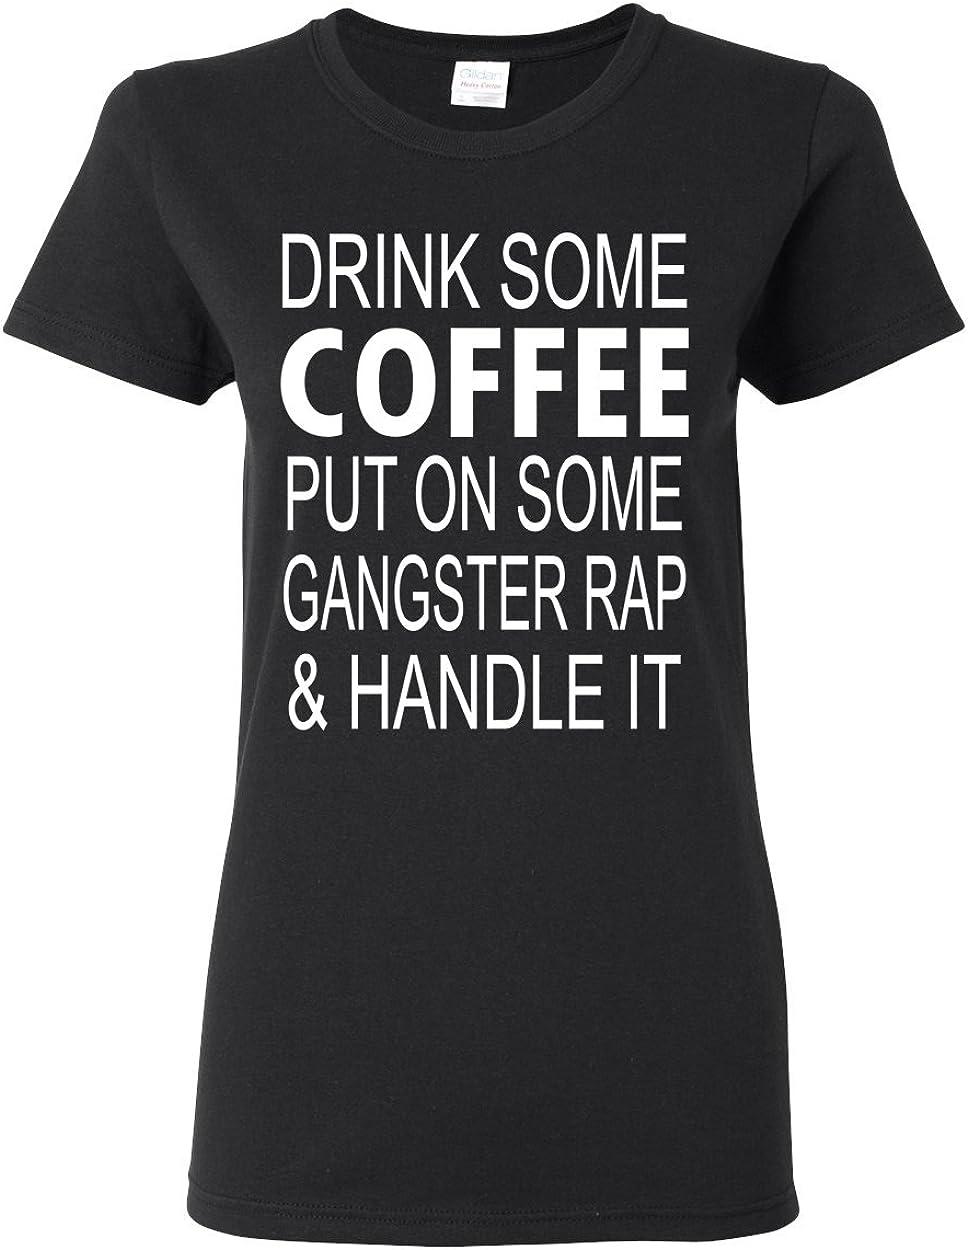 Custom Apparel R Us Drink Coffee Gangster Womens T-Shirt